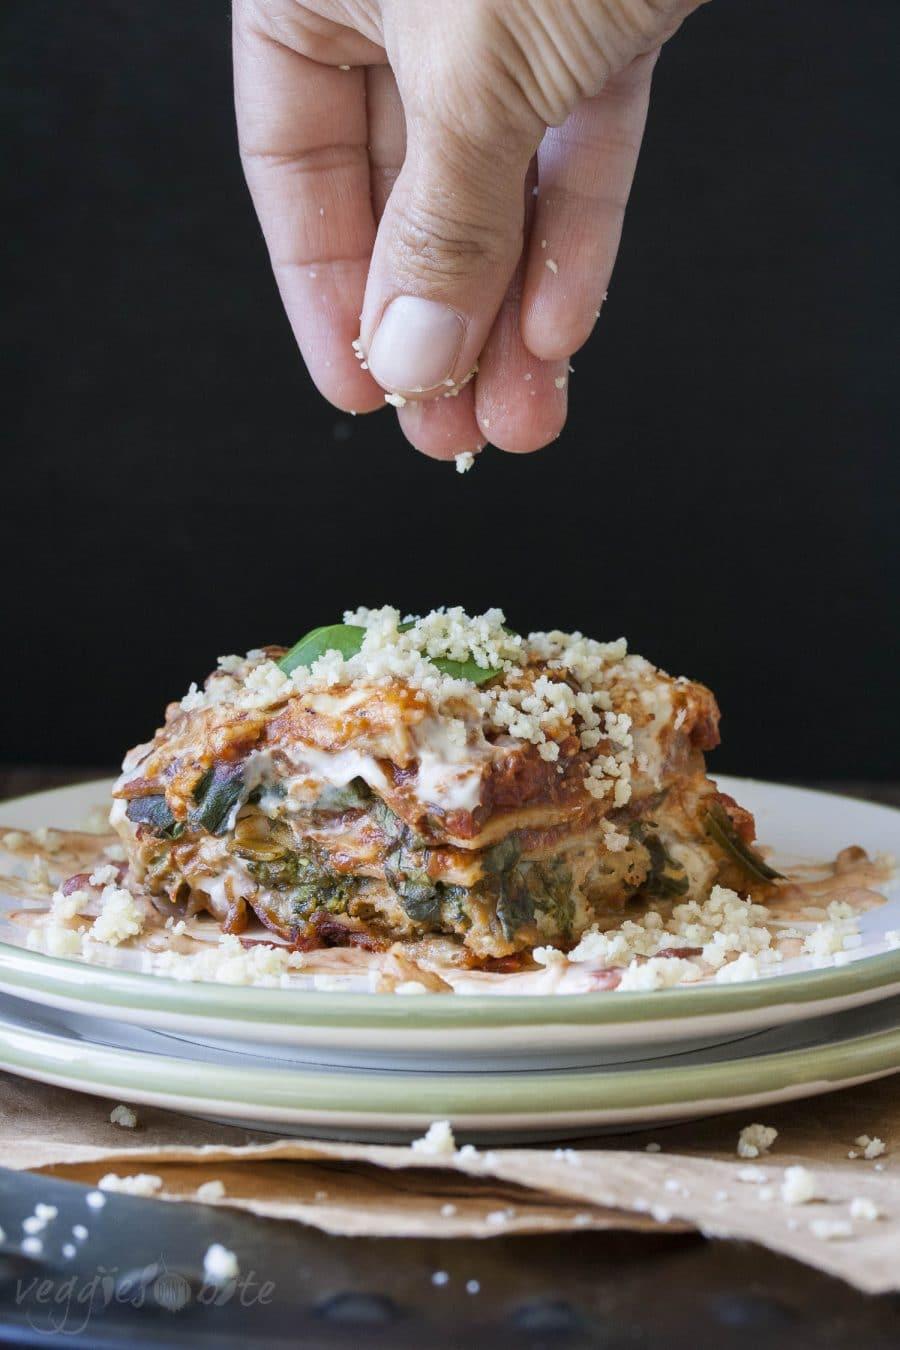 Hand sprinkling vegan parmesan cheese on top of lasagna